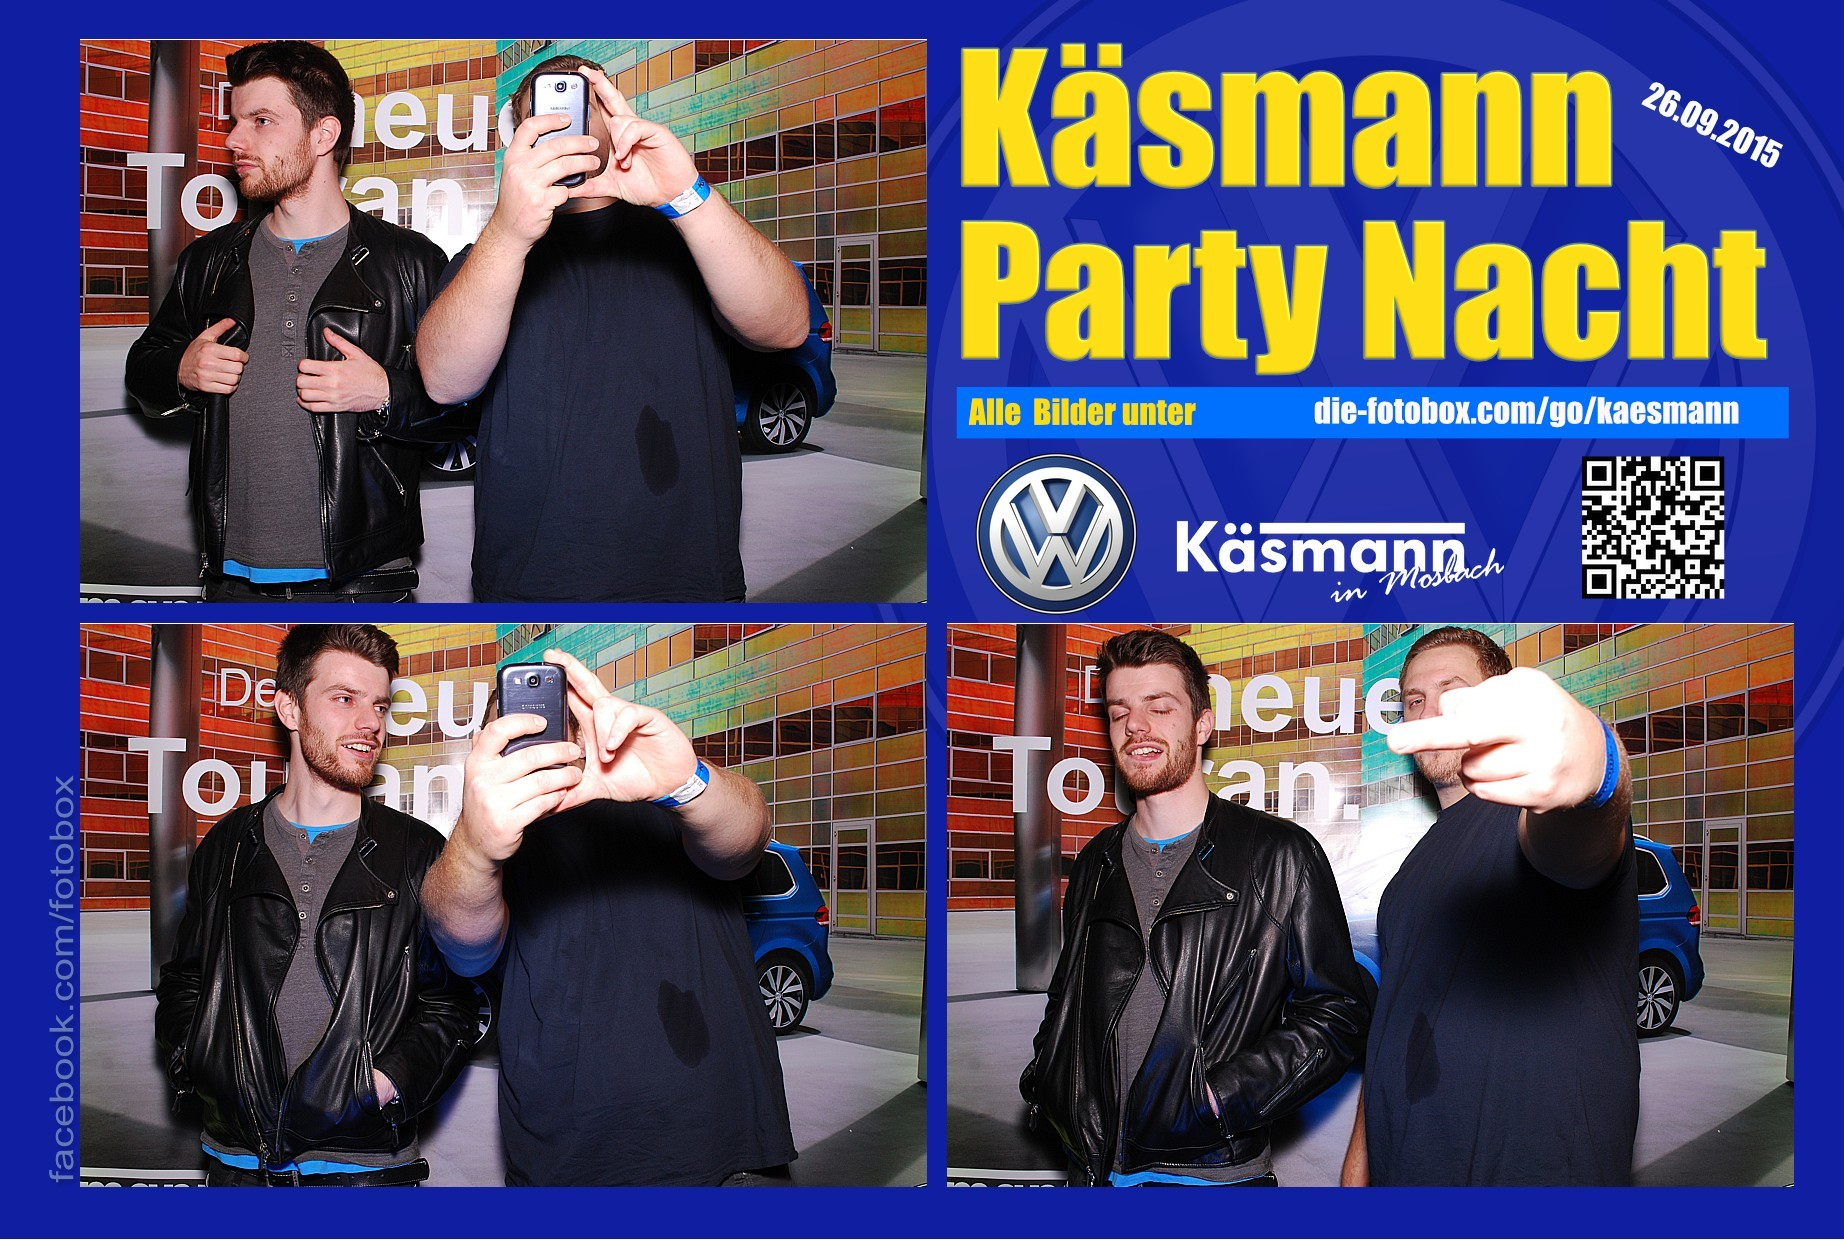 Käsmannparty 2015 - www.die-fotobox.com 01068